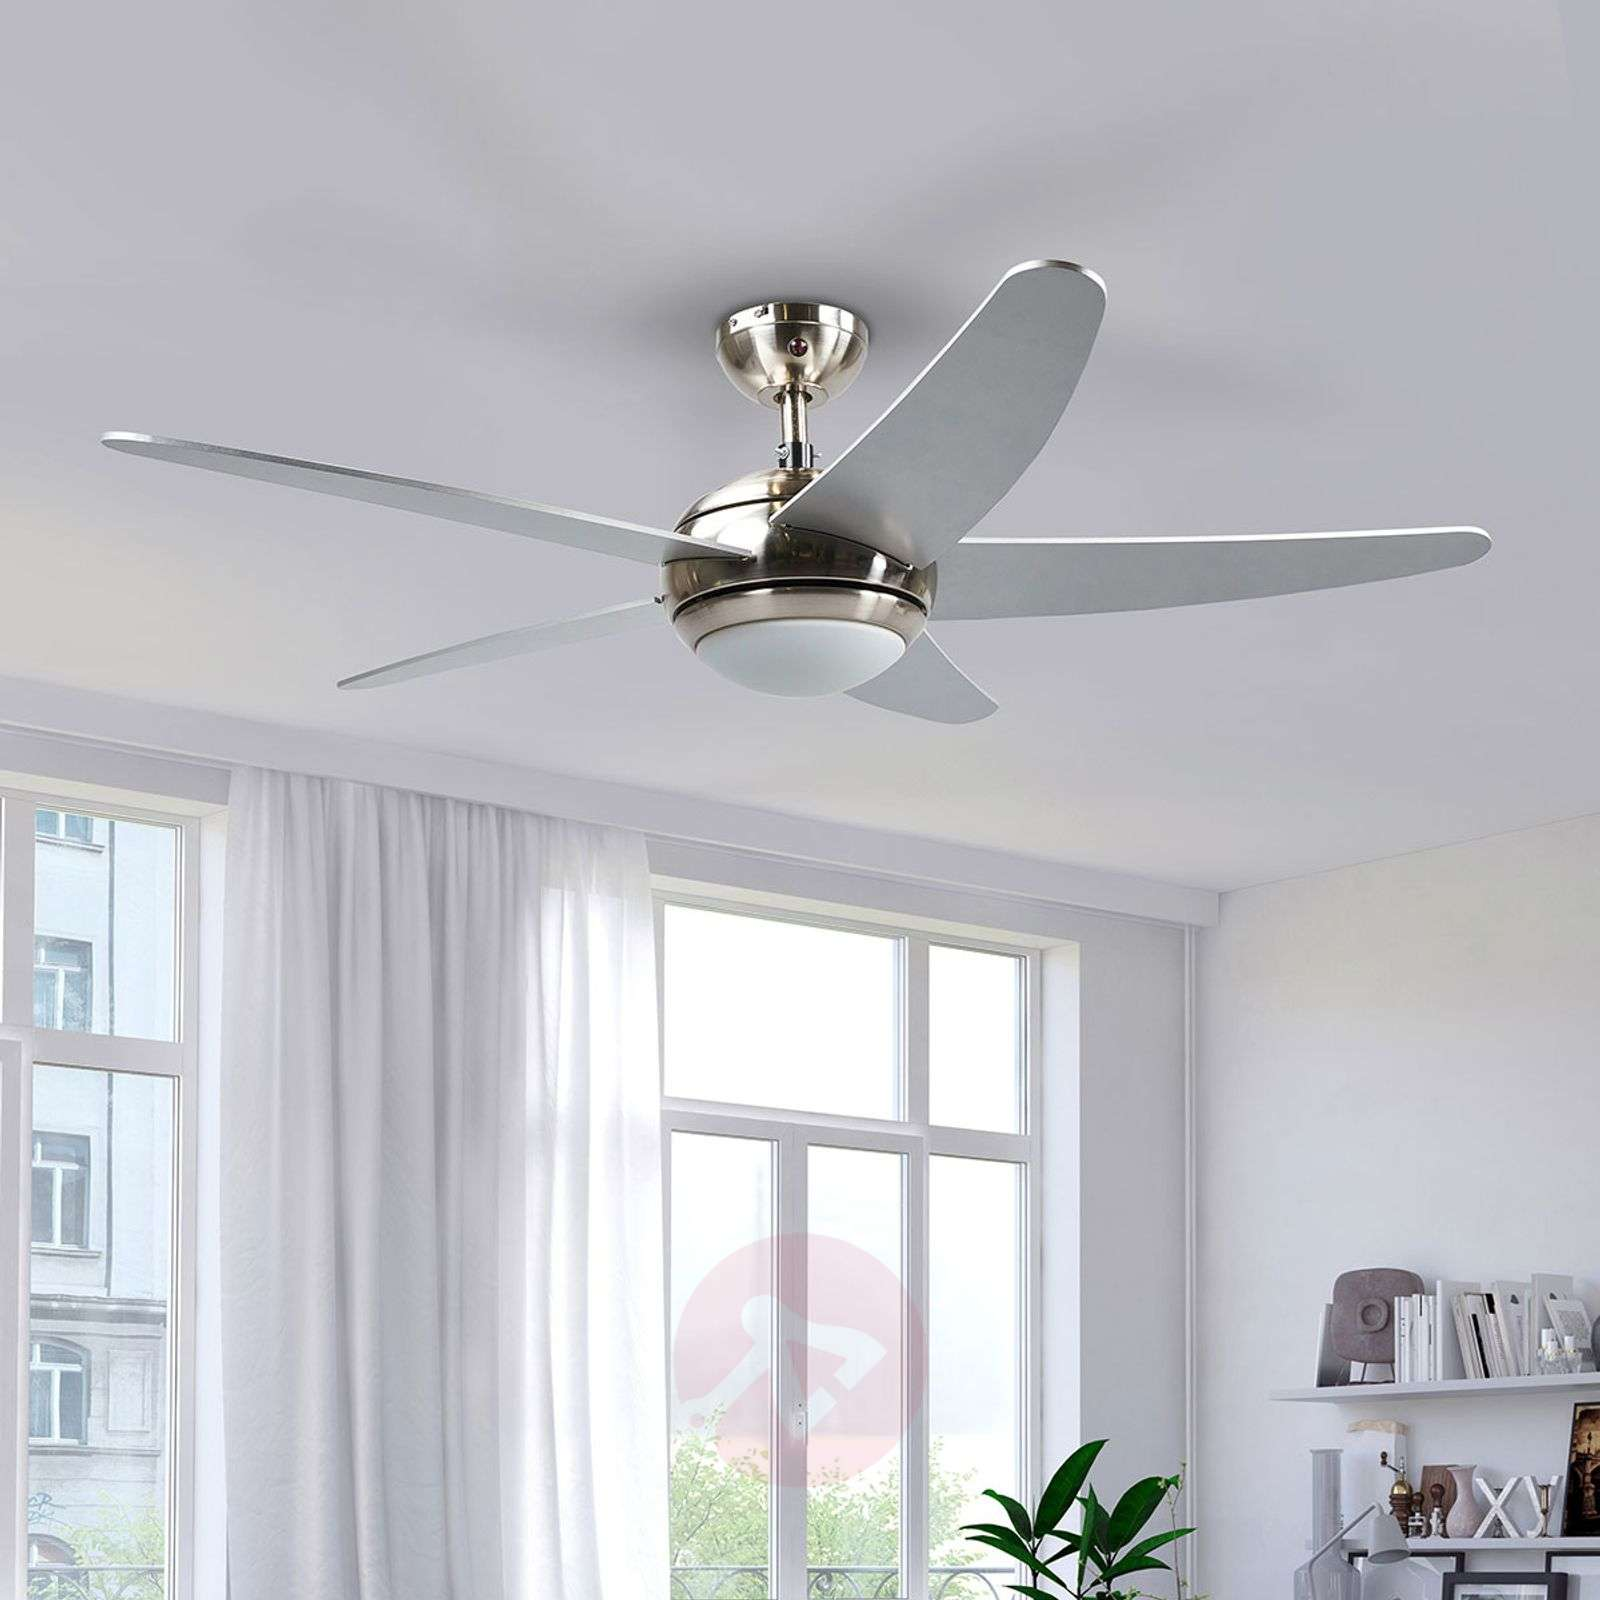 Hopeanvärinen, LED-valaistu kattotuuletin Anneka-4018094-010